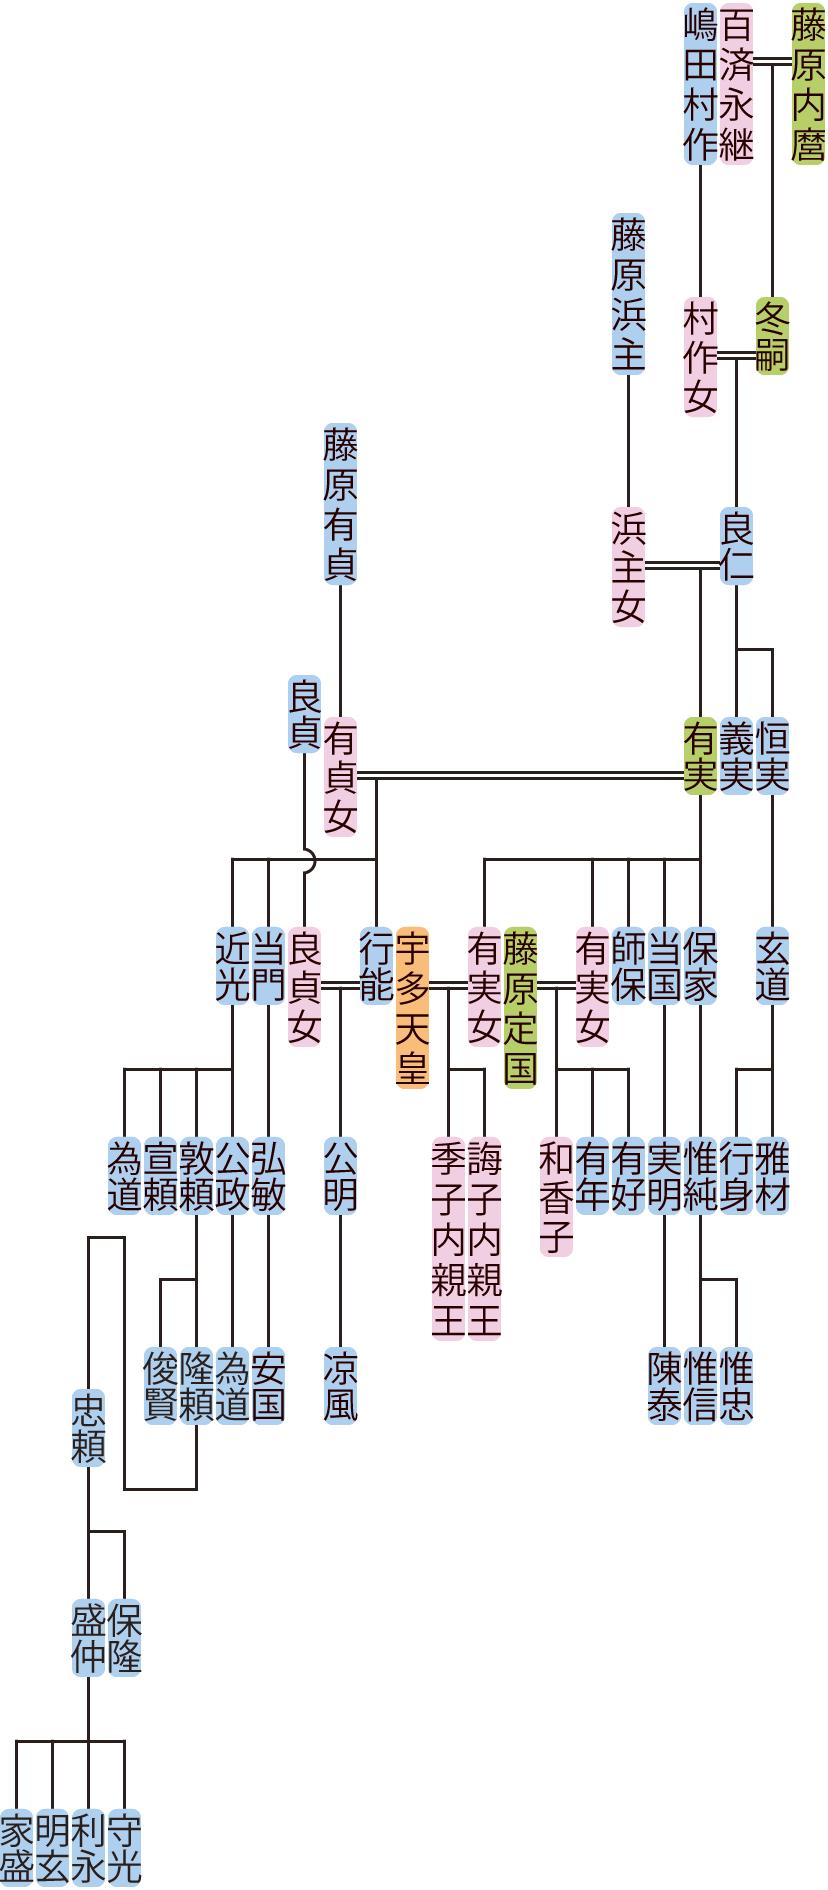 藤原良仁の系図